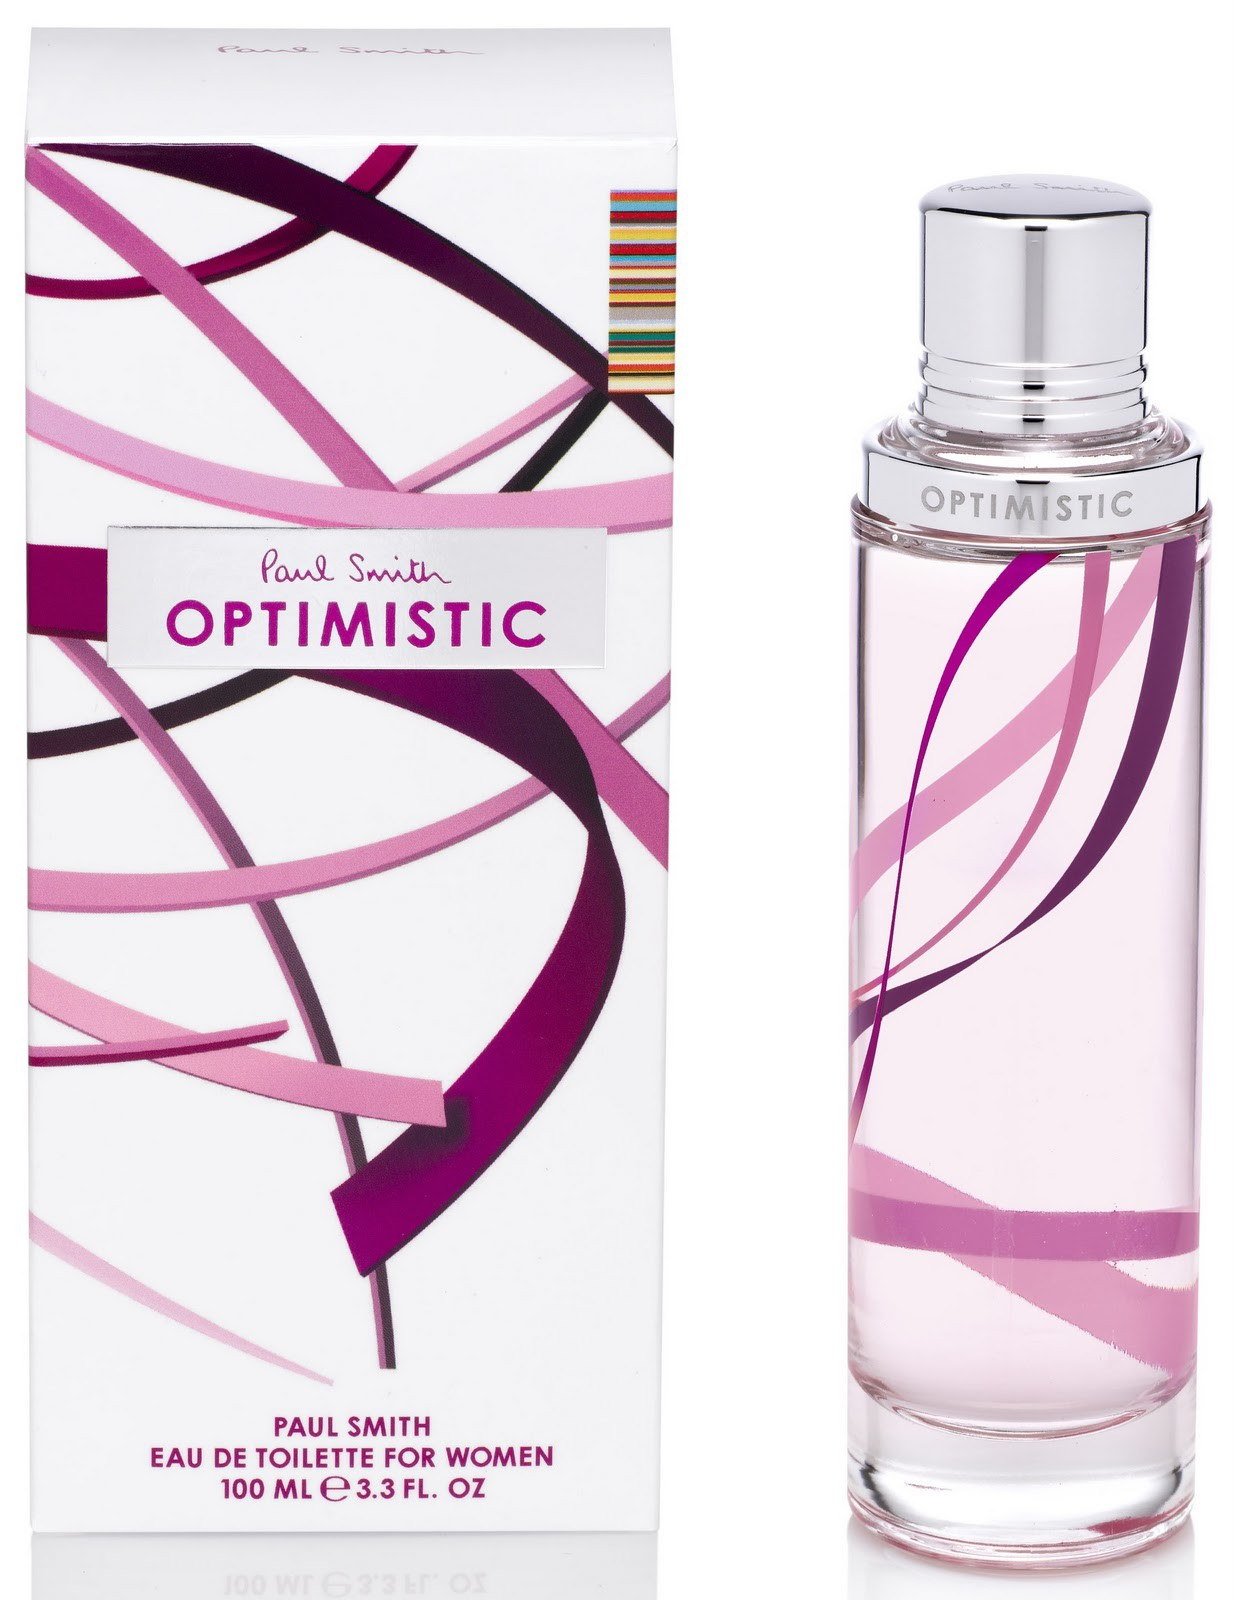 Paul Smith Optimistic for Women аромат для женщин